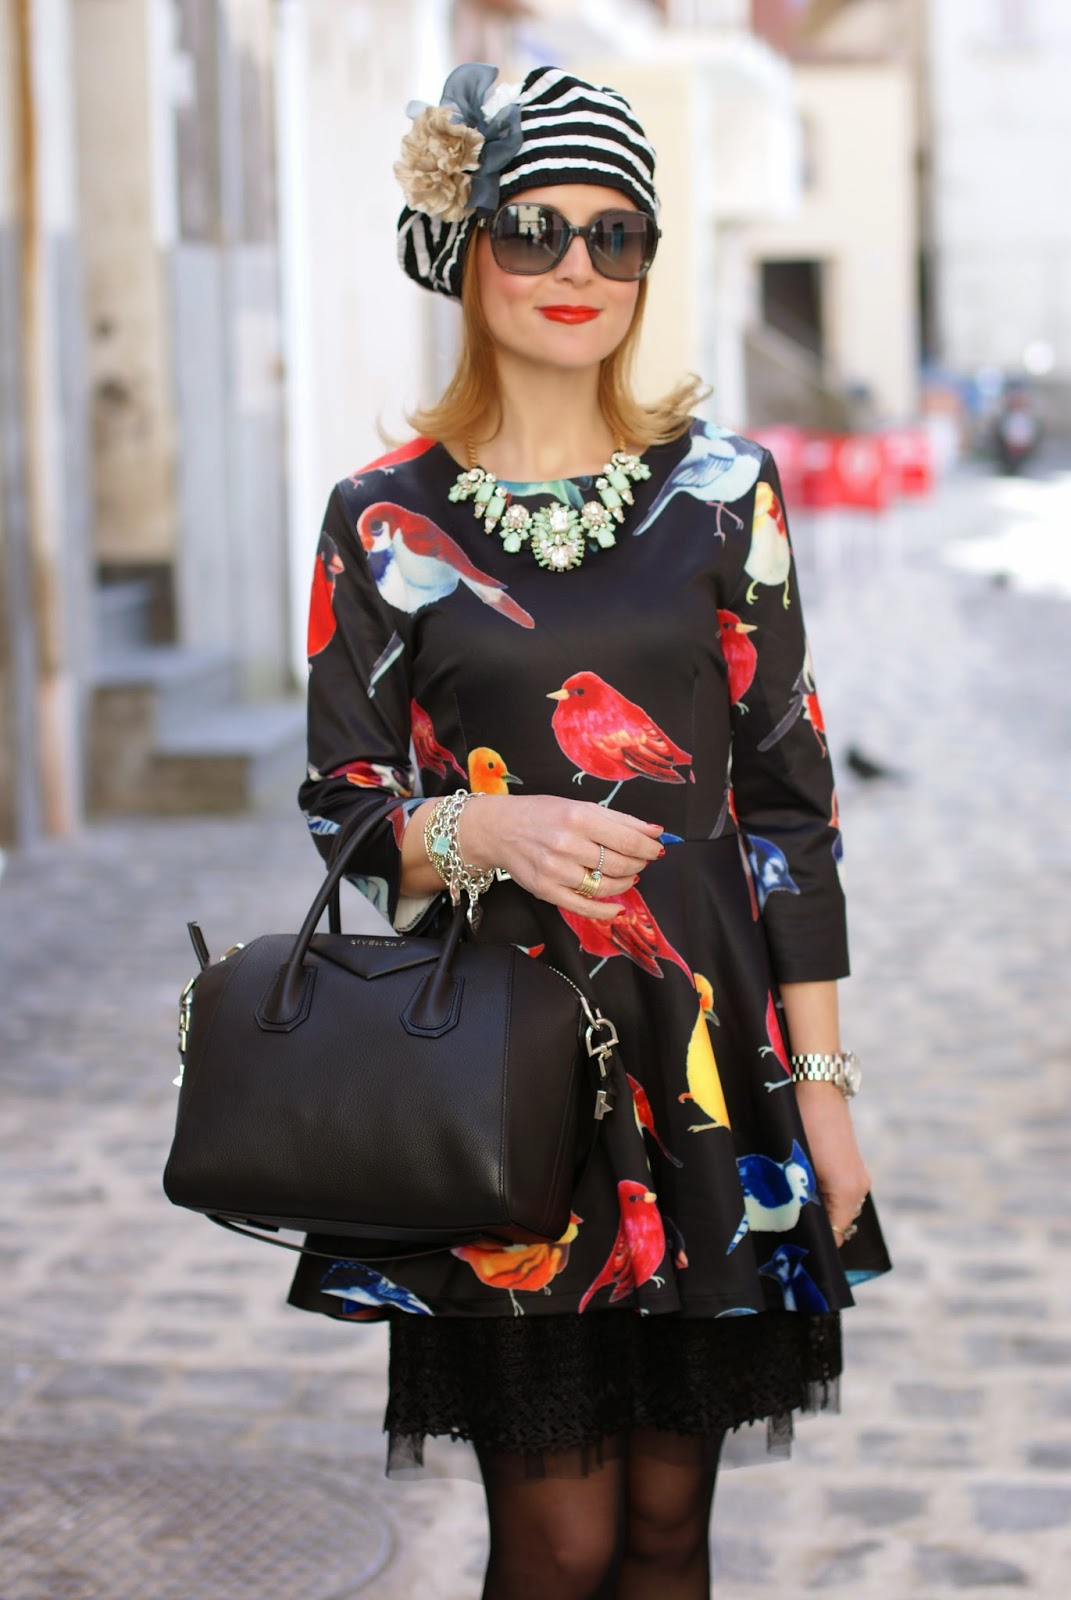 sheinside birds print dress, Unica striped hat, Givenchy Antigona bag, Fashion and Cookies, fashion blogger